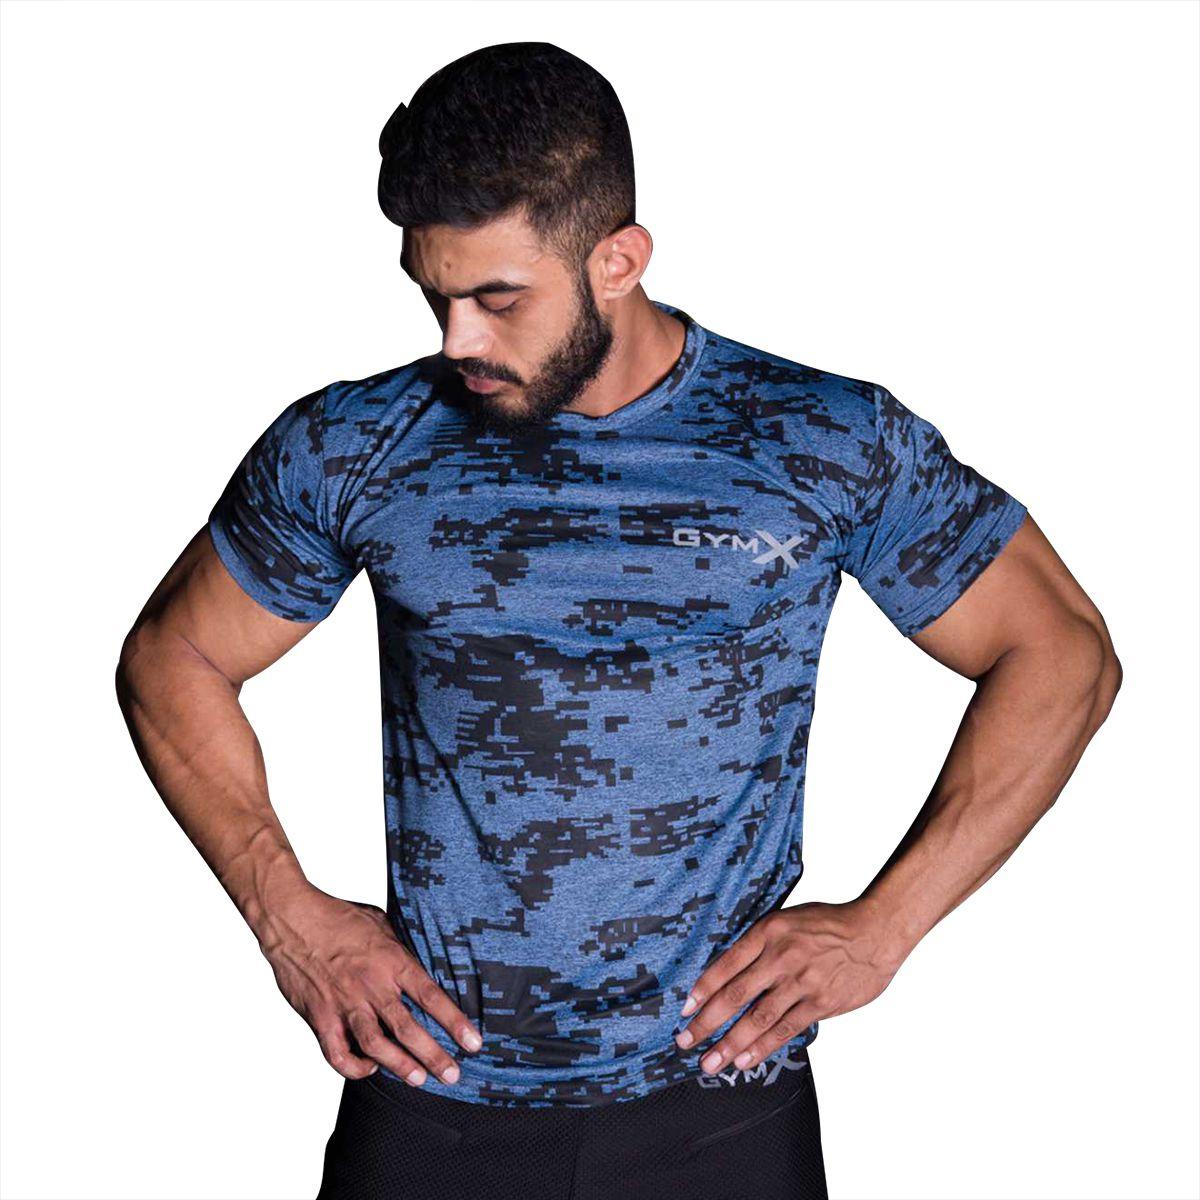 GymX Mens Space Blue Tshirt- Matrix Camo (Dry Fit)